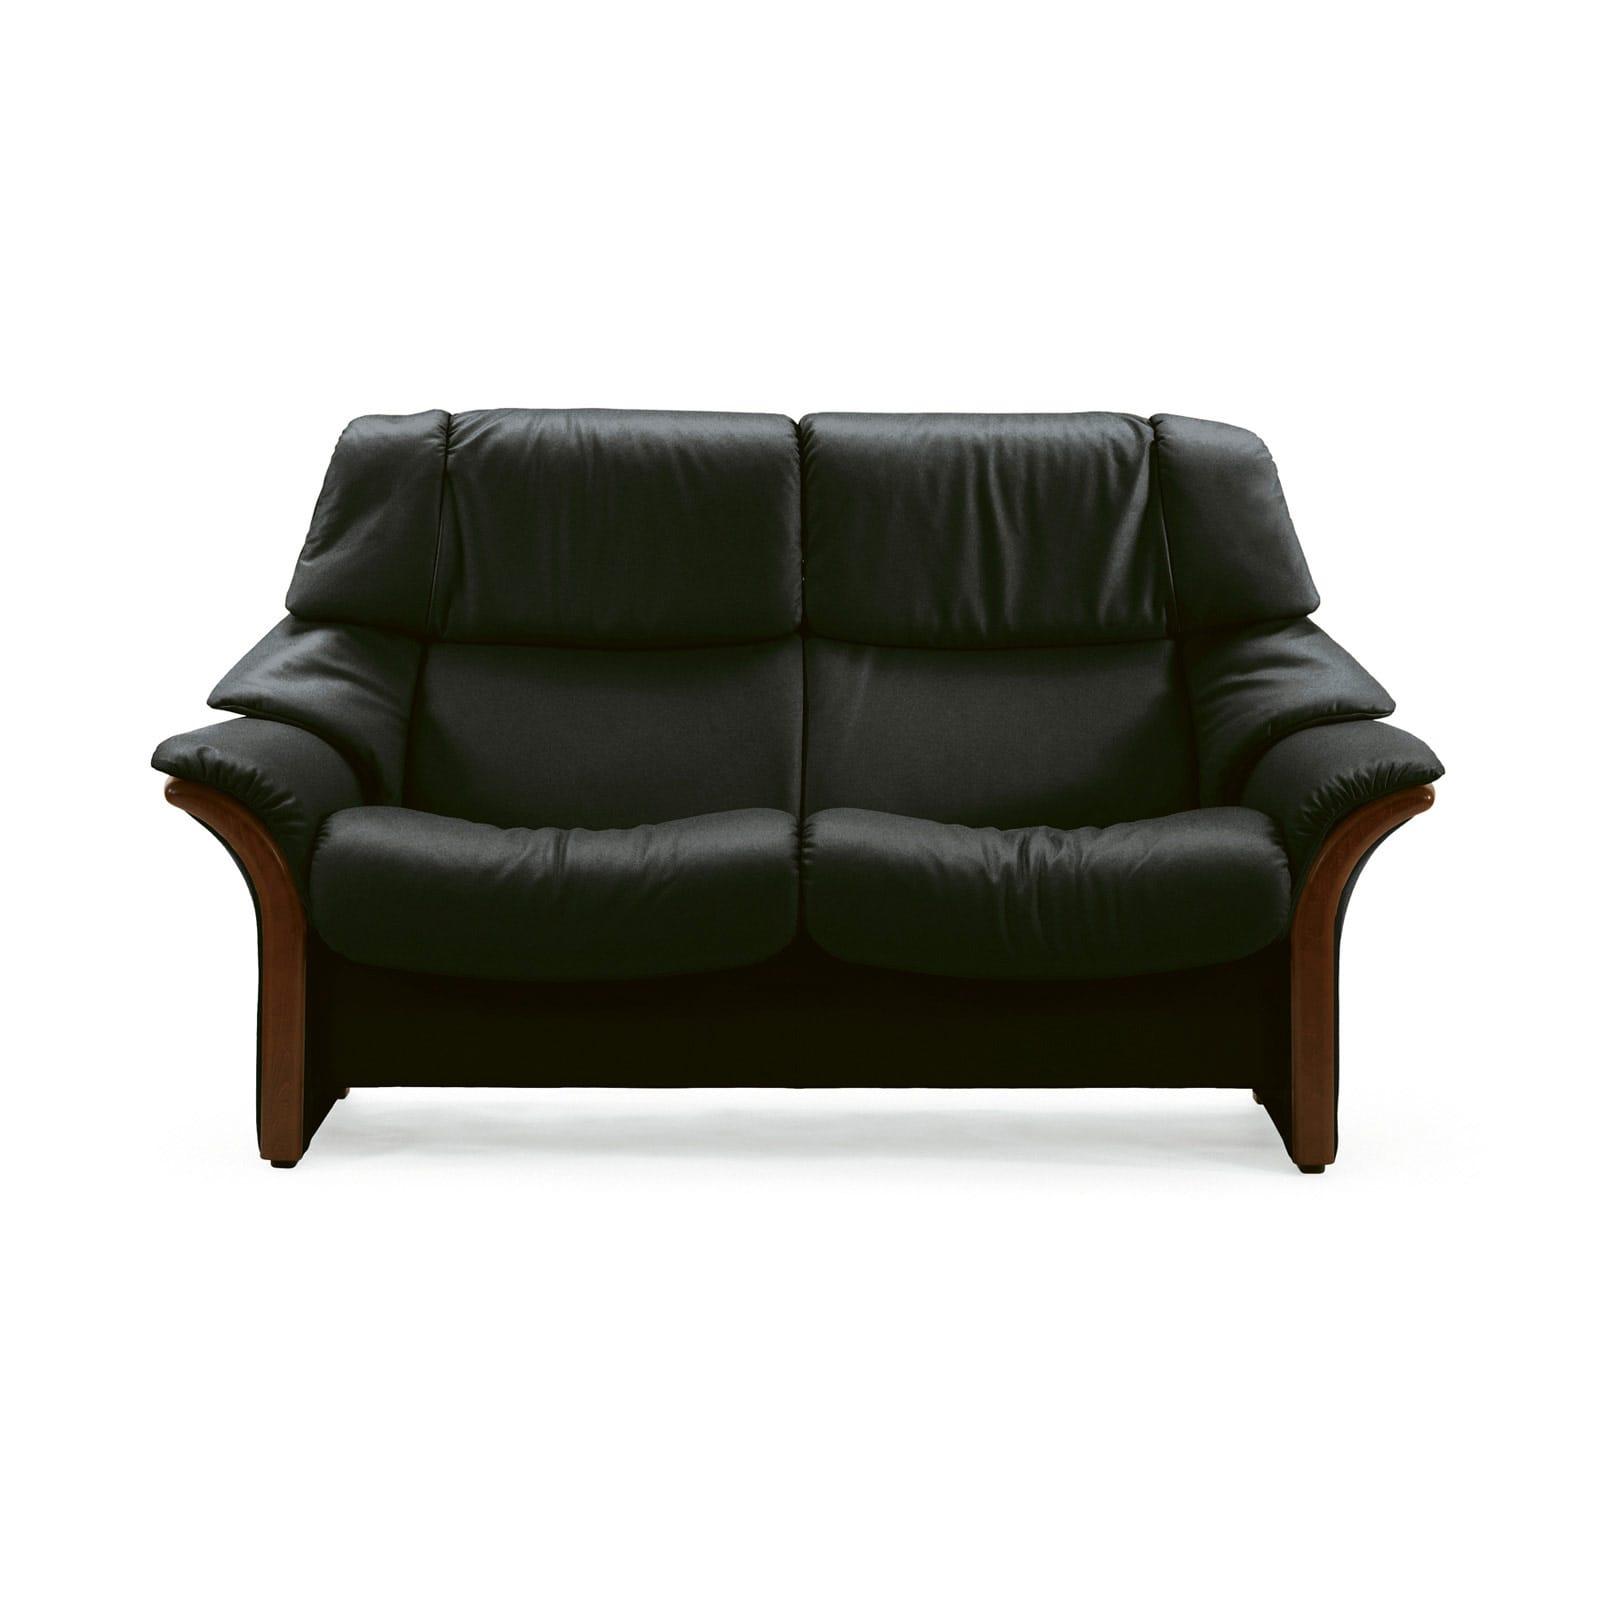 stressless sofa 2 sitzer eldorado m hoch black braun. Black Bedroom Furniture Sets. Home Design Ideas